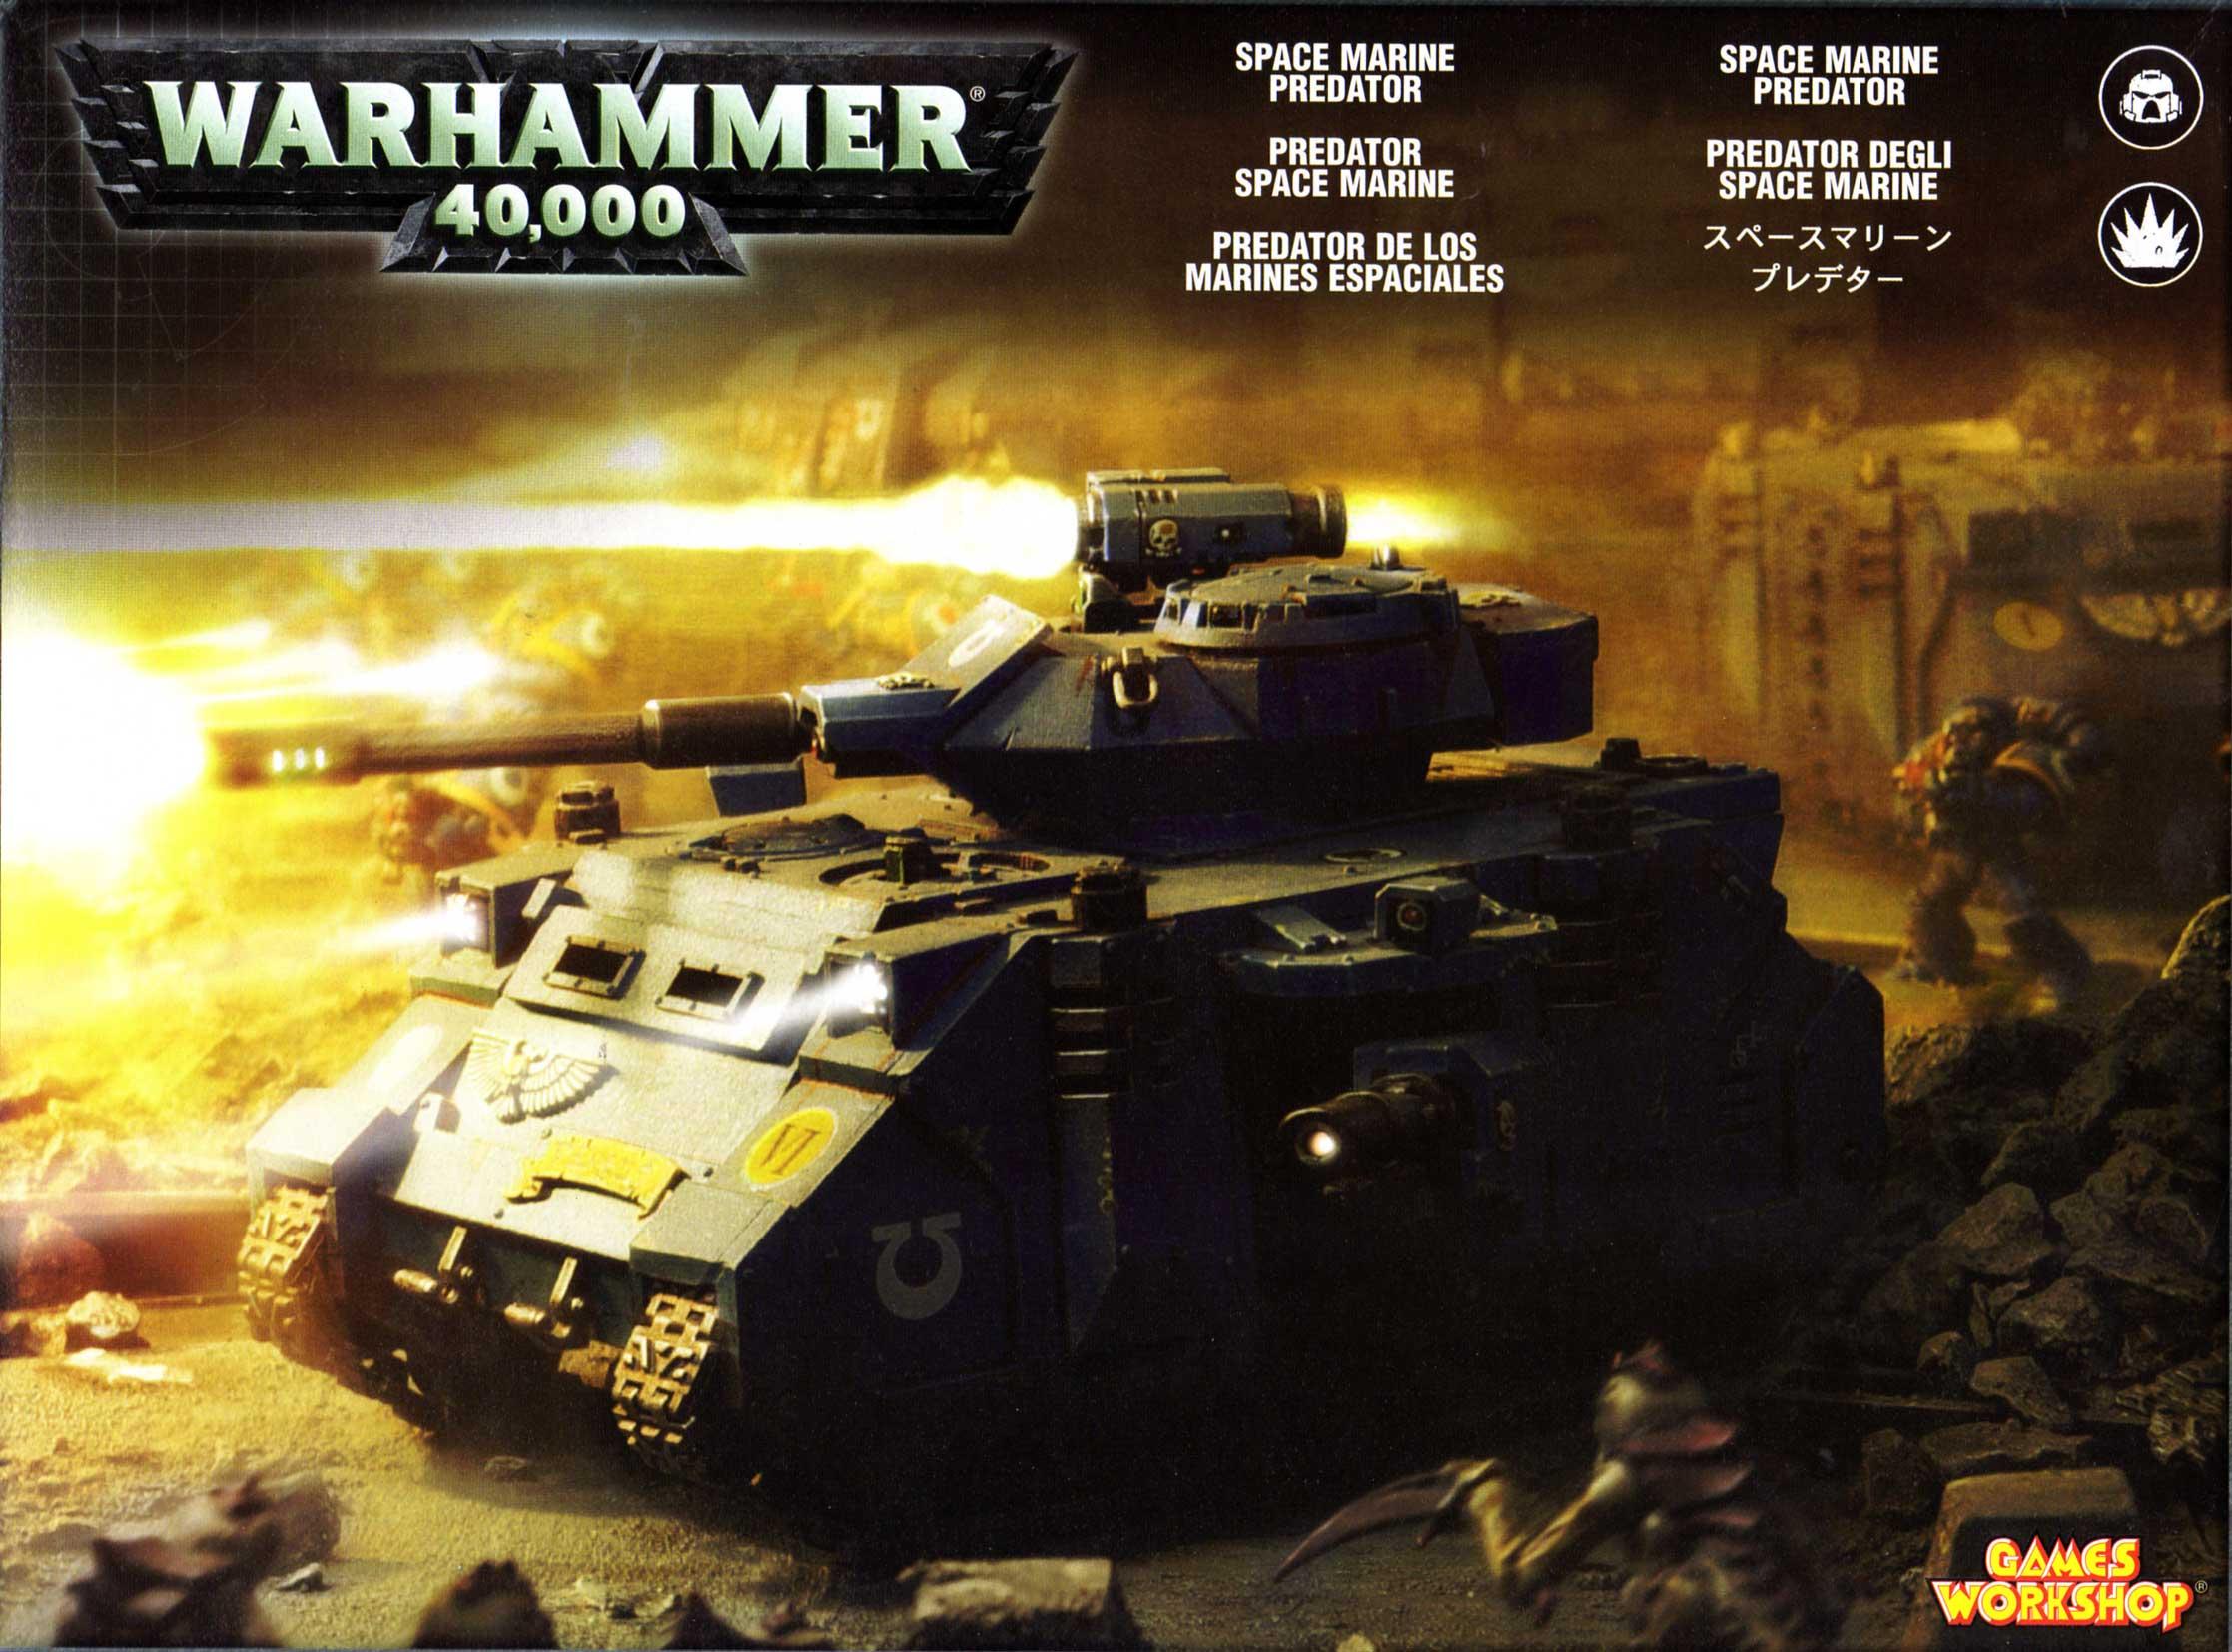 boîte face Tank Predator (Space Marine - Warhammer 40.000)